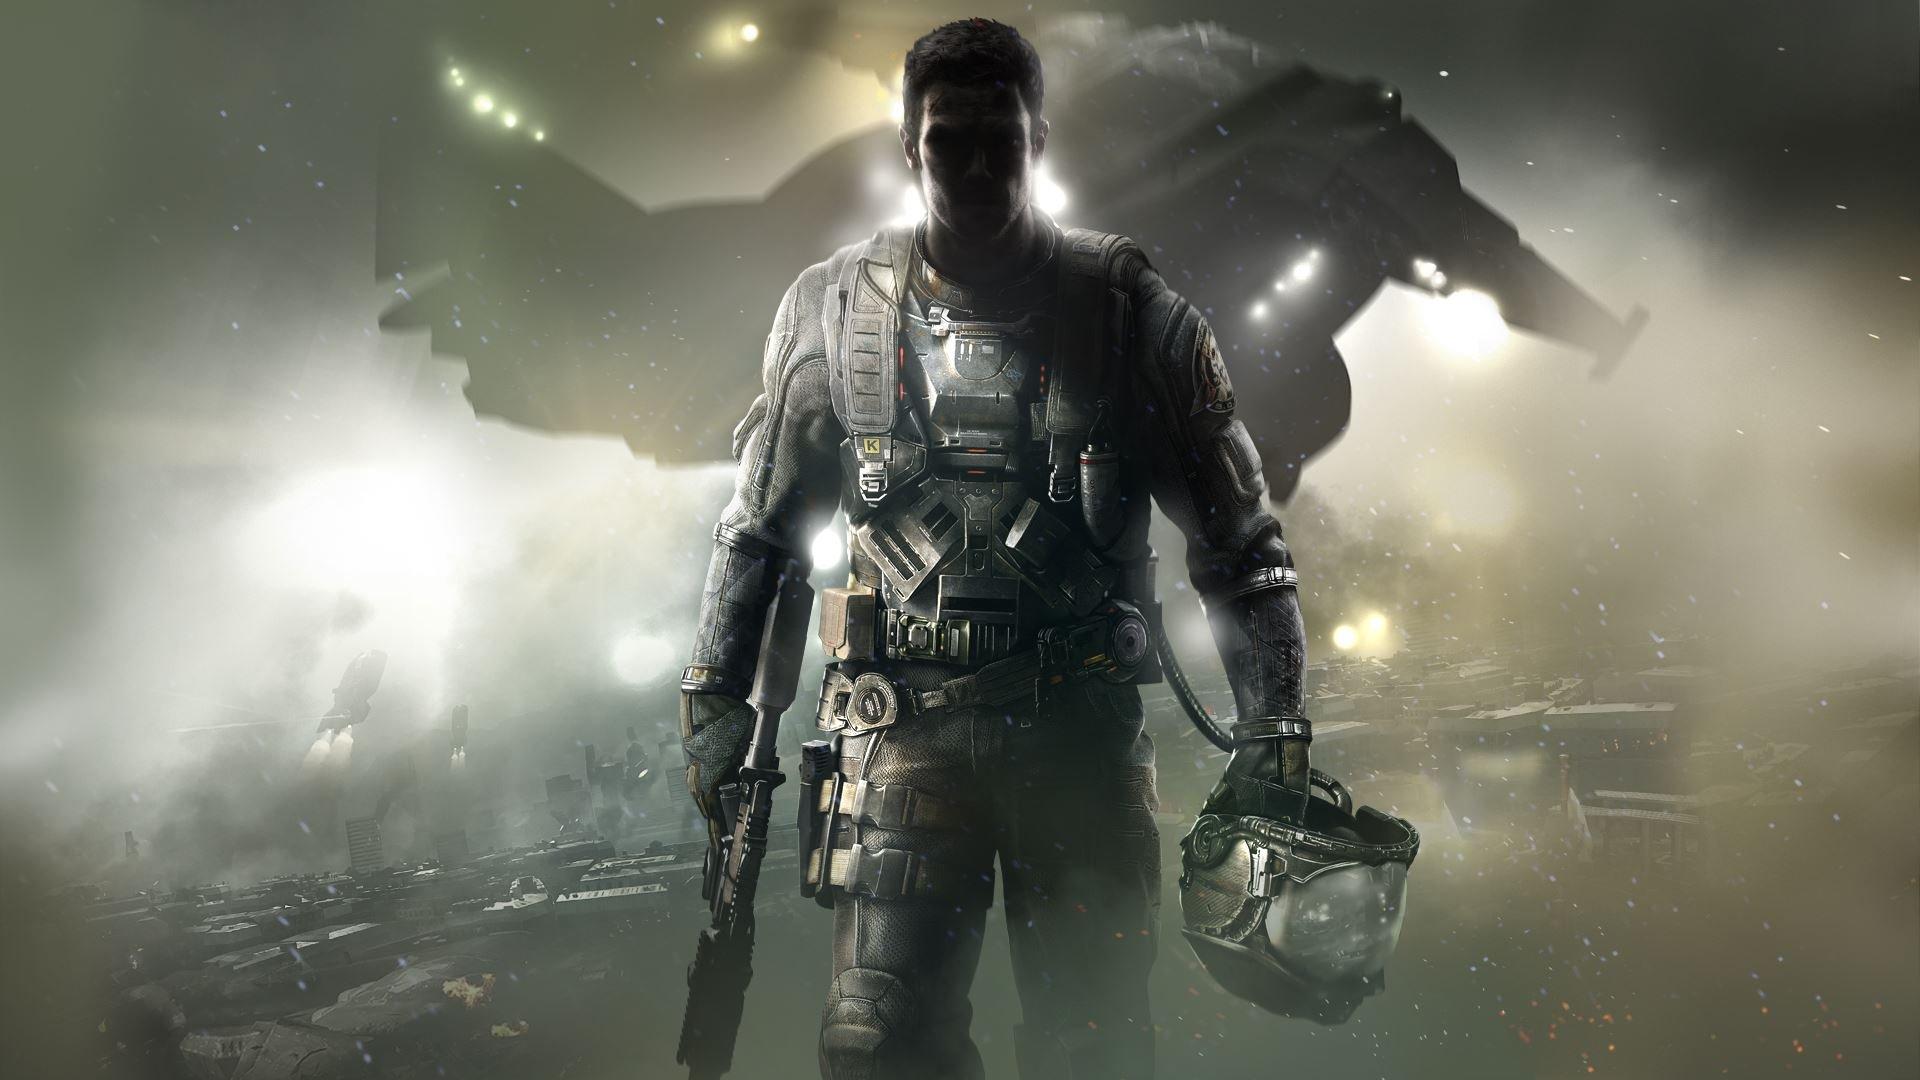 Call of Duty: Infinite Warfare - Spoilers